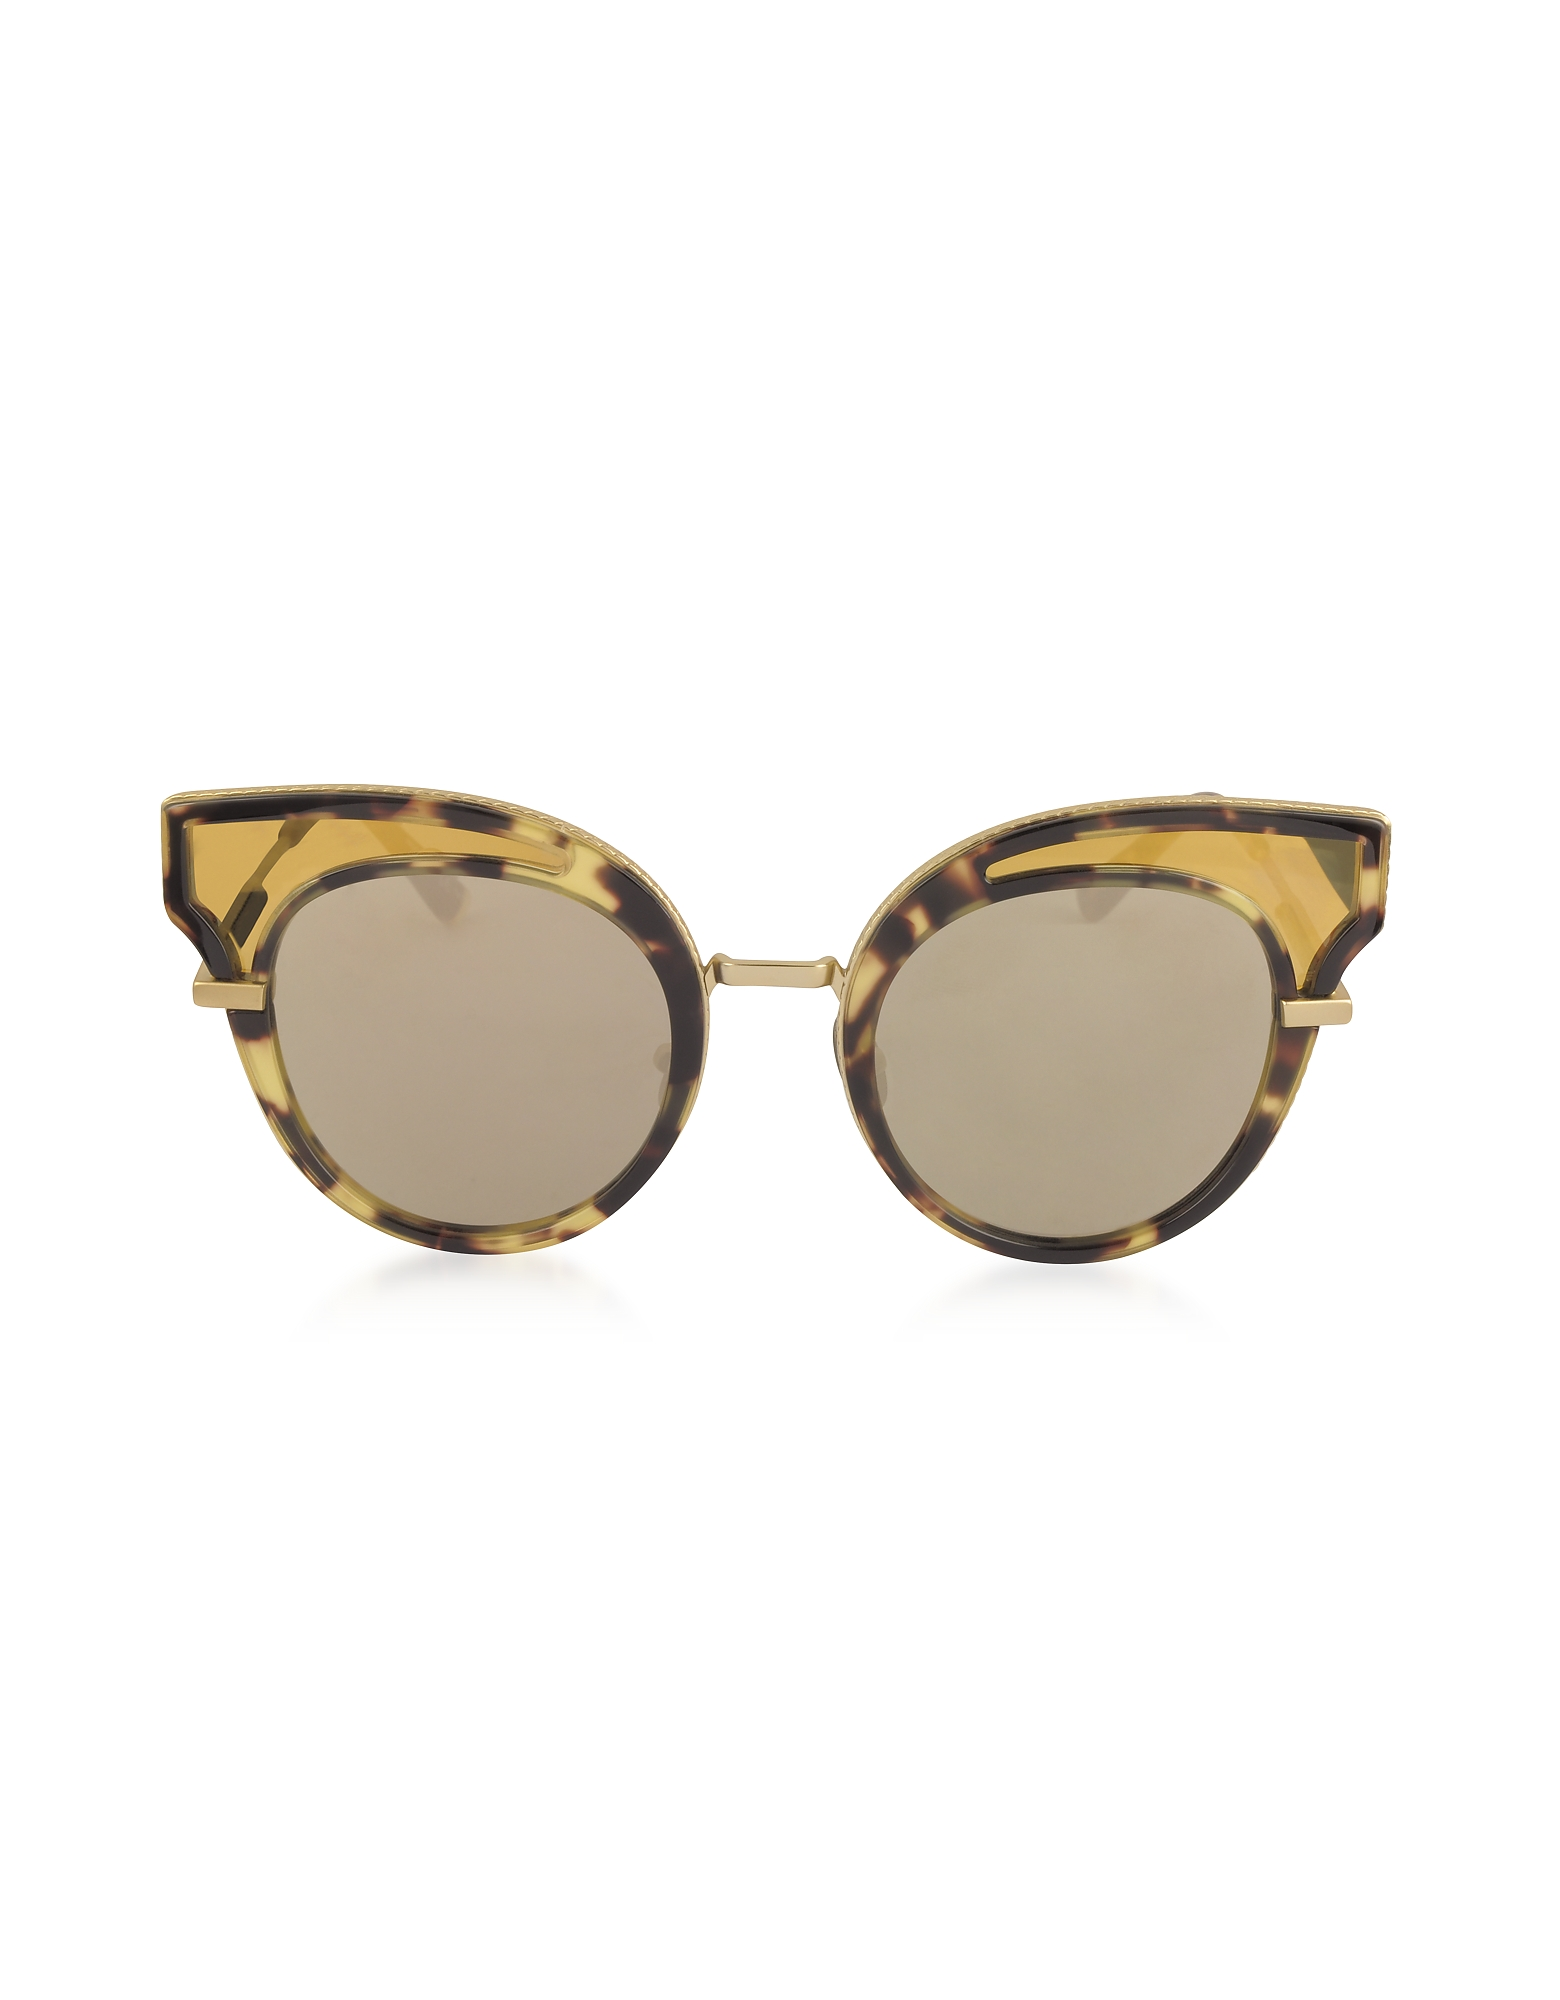 Bottega Veneta Sunglasses, BV0094S Acetate Cat Eye Women's Sunglasses